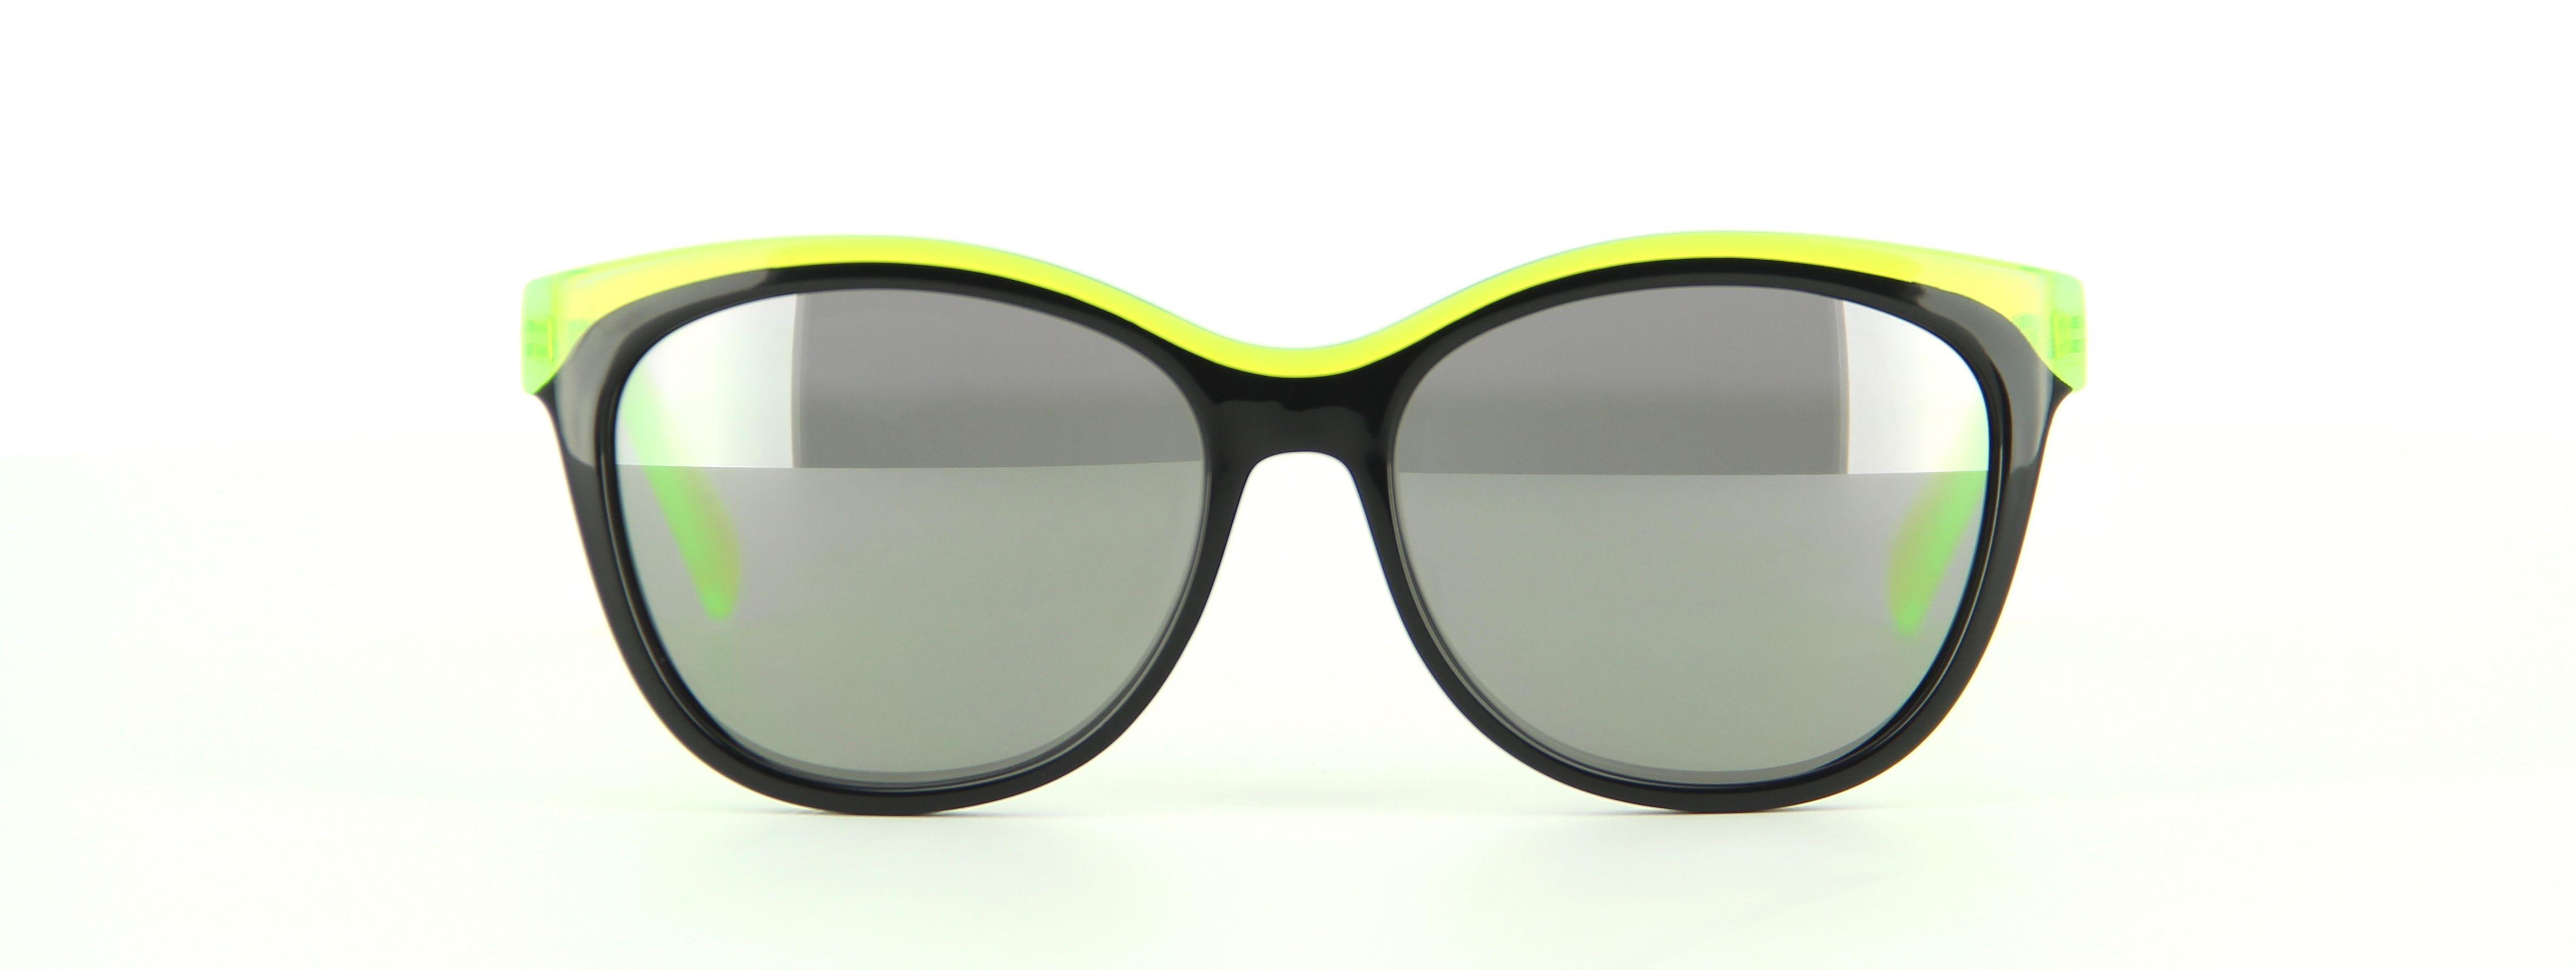 84288319b715b9 Sunglasses 0mmx0mm 0€   Sunglasses   Sunglasses, Marc jacobs, Eyewear